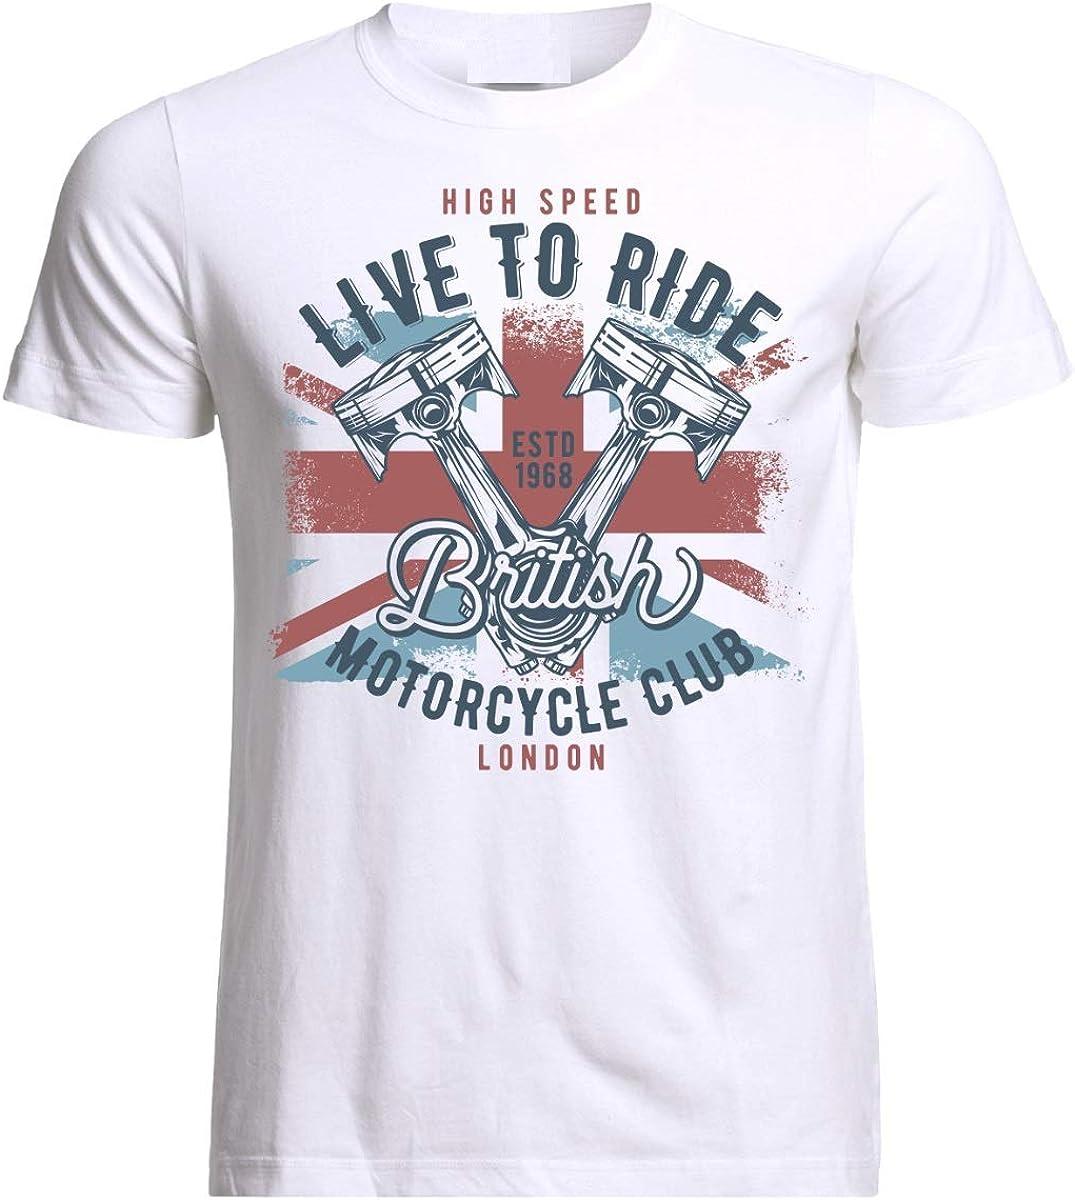 Motorcycle Chopper Motocross Bike Biker Motorrad Moto Rider T-Shirt